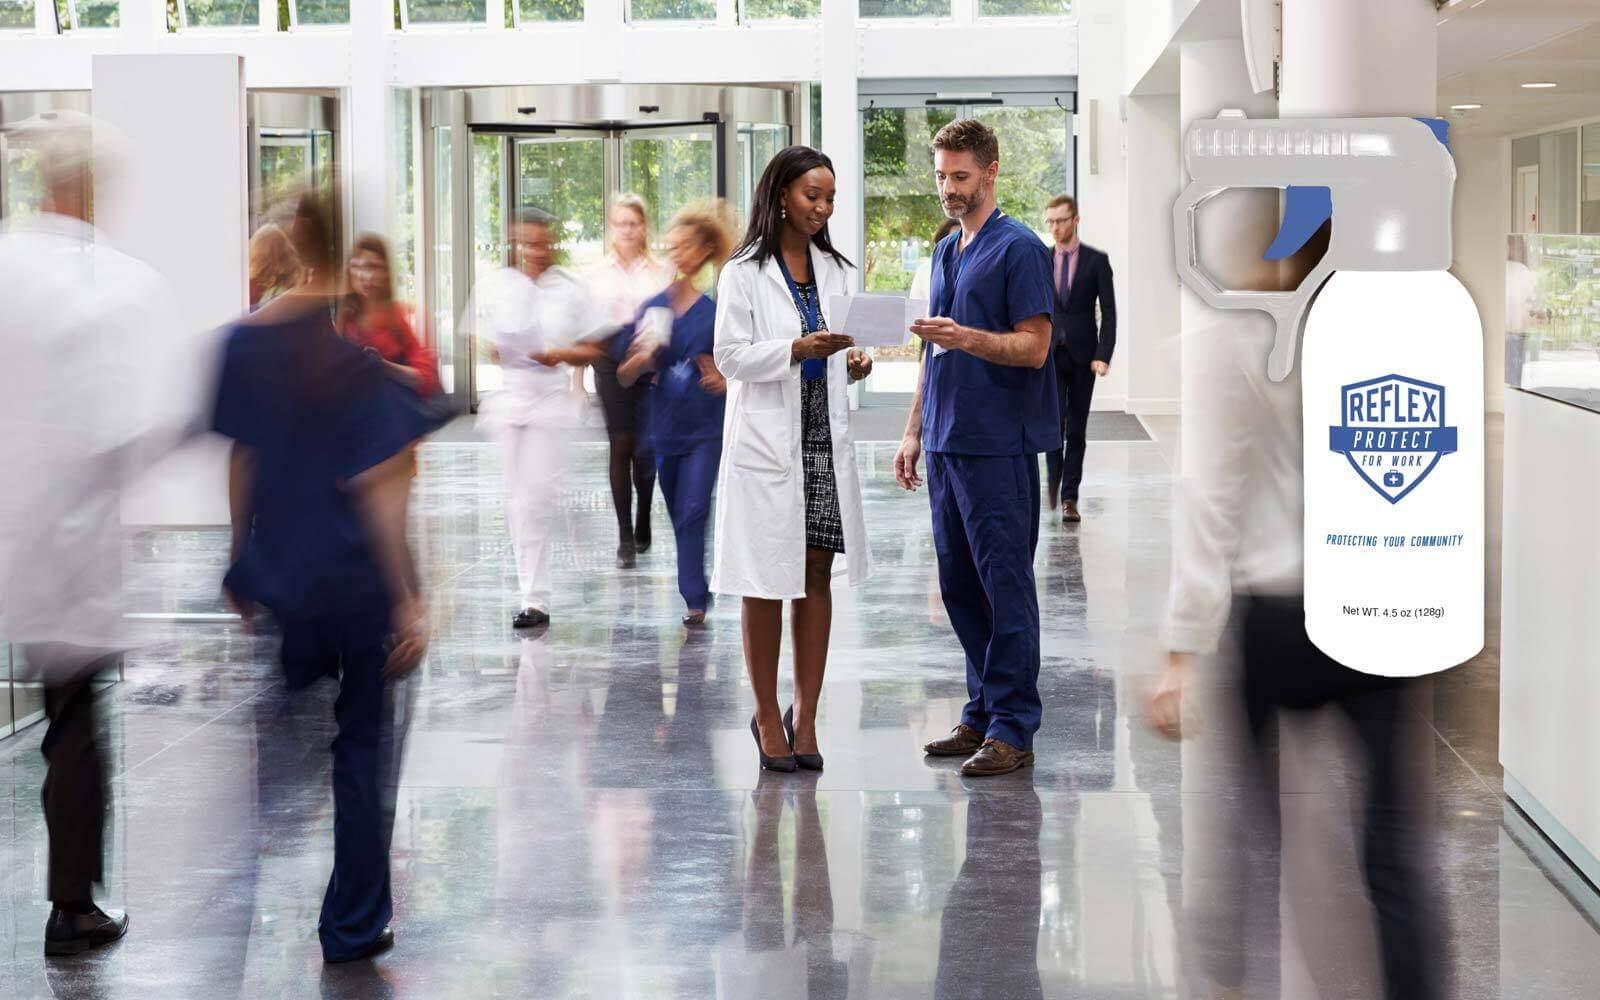 hospital-reflex-protect-for-work-min_1600x